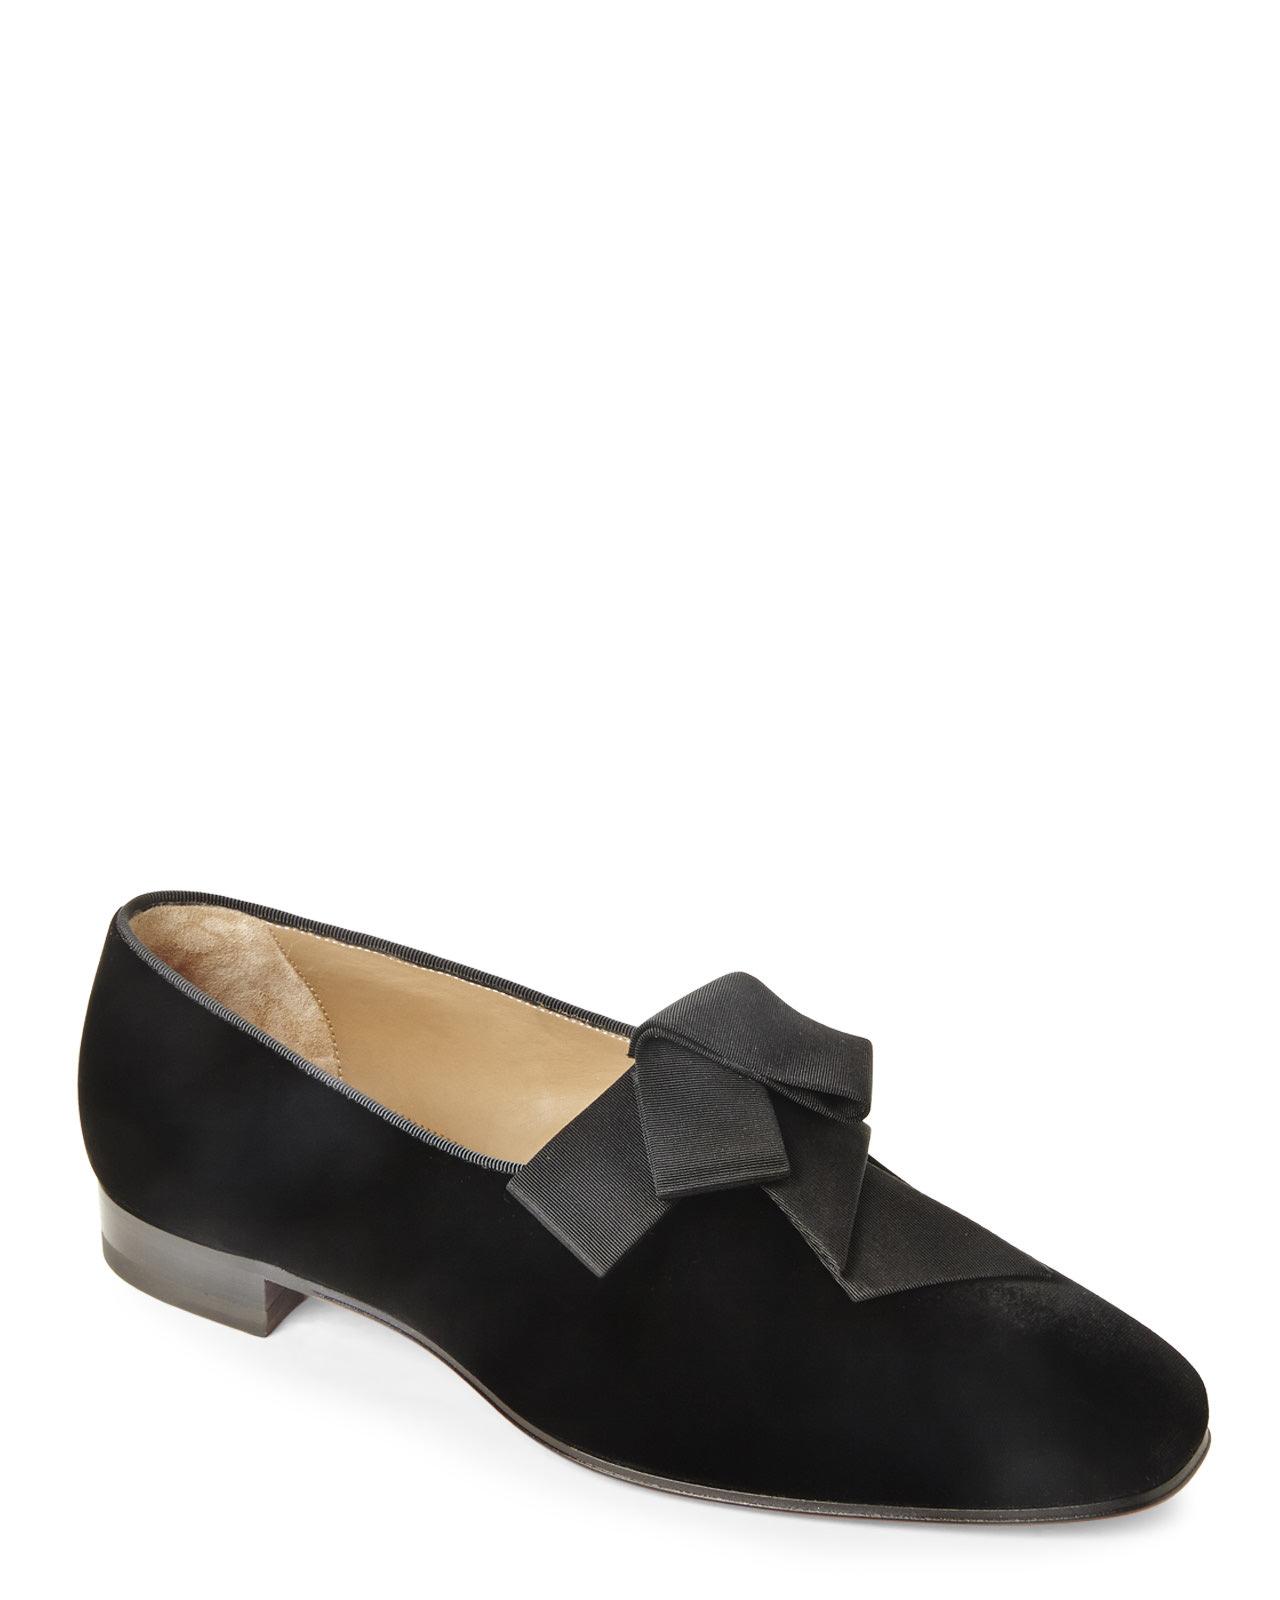 23ce14160225 Christian louboutin Black Mr. Grant Loafers in Black for Men